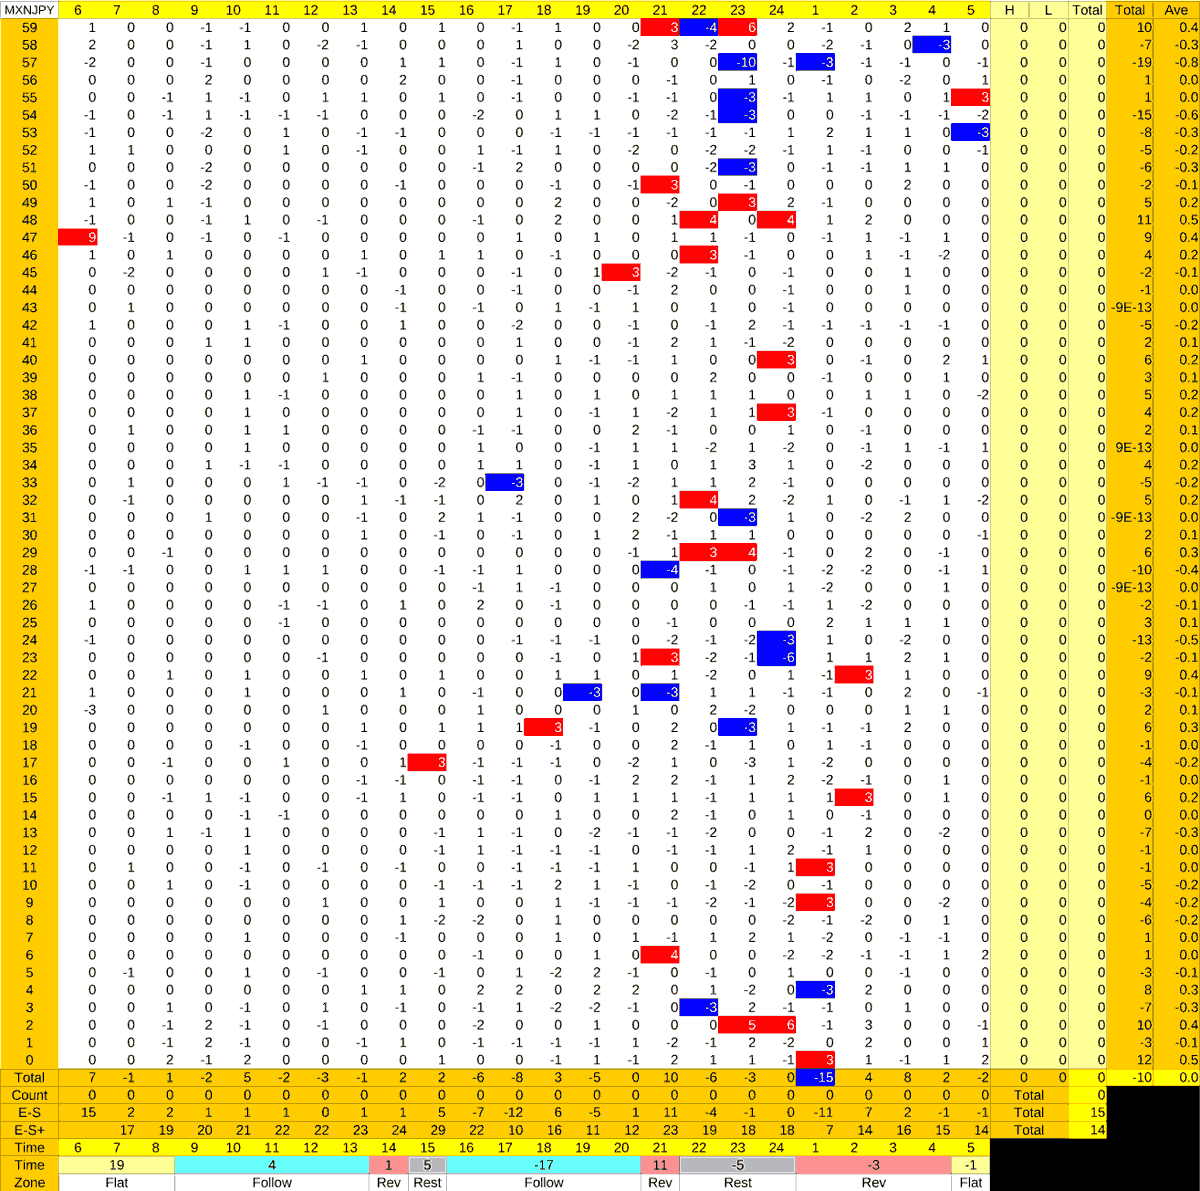 20210630_HS(3)MXNJPY